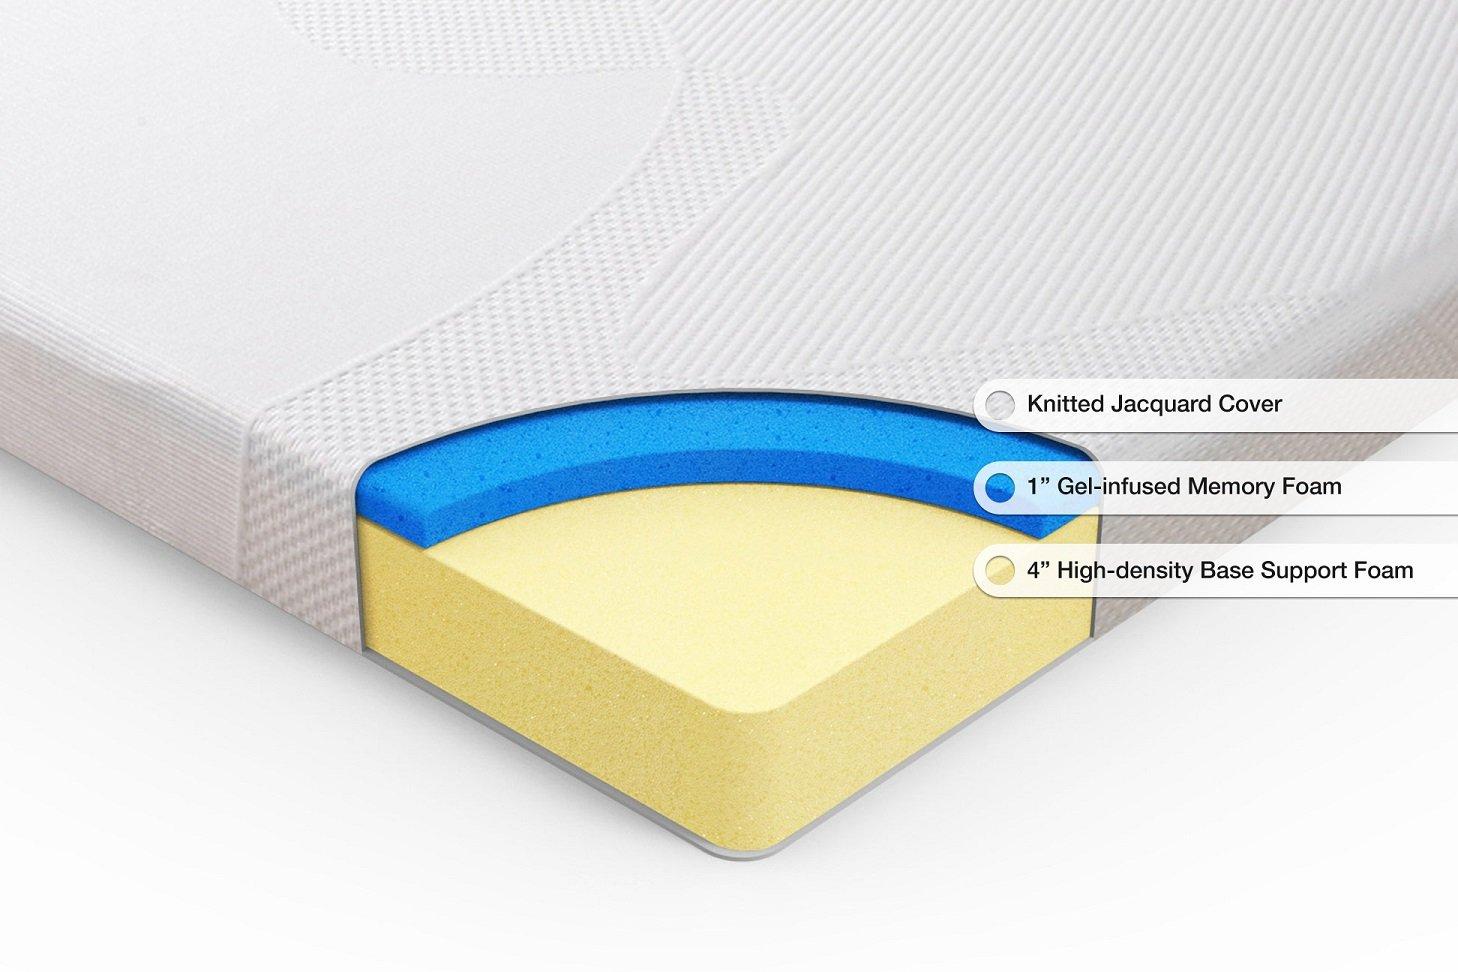 sleep master cool gel memory foam 5 inch sleeper sofa mattress replacement sofa ebay. Black Bedroom Furniture Sets. Home Design Ideas